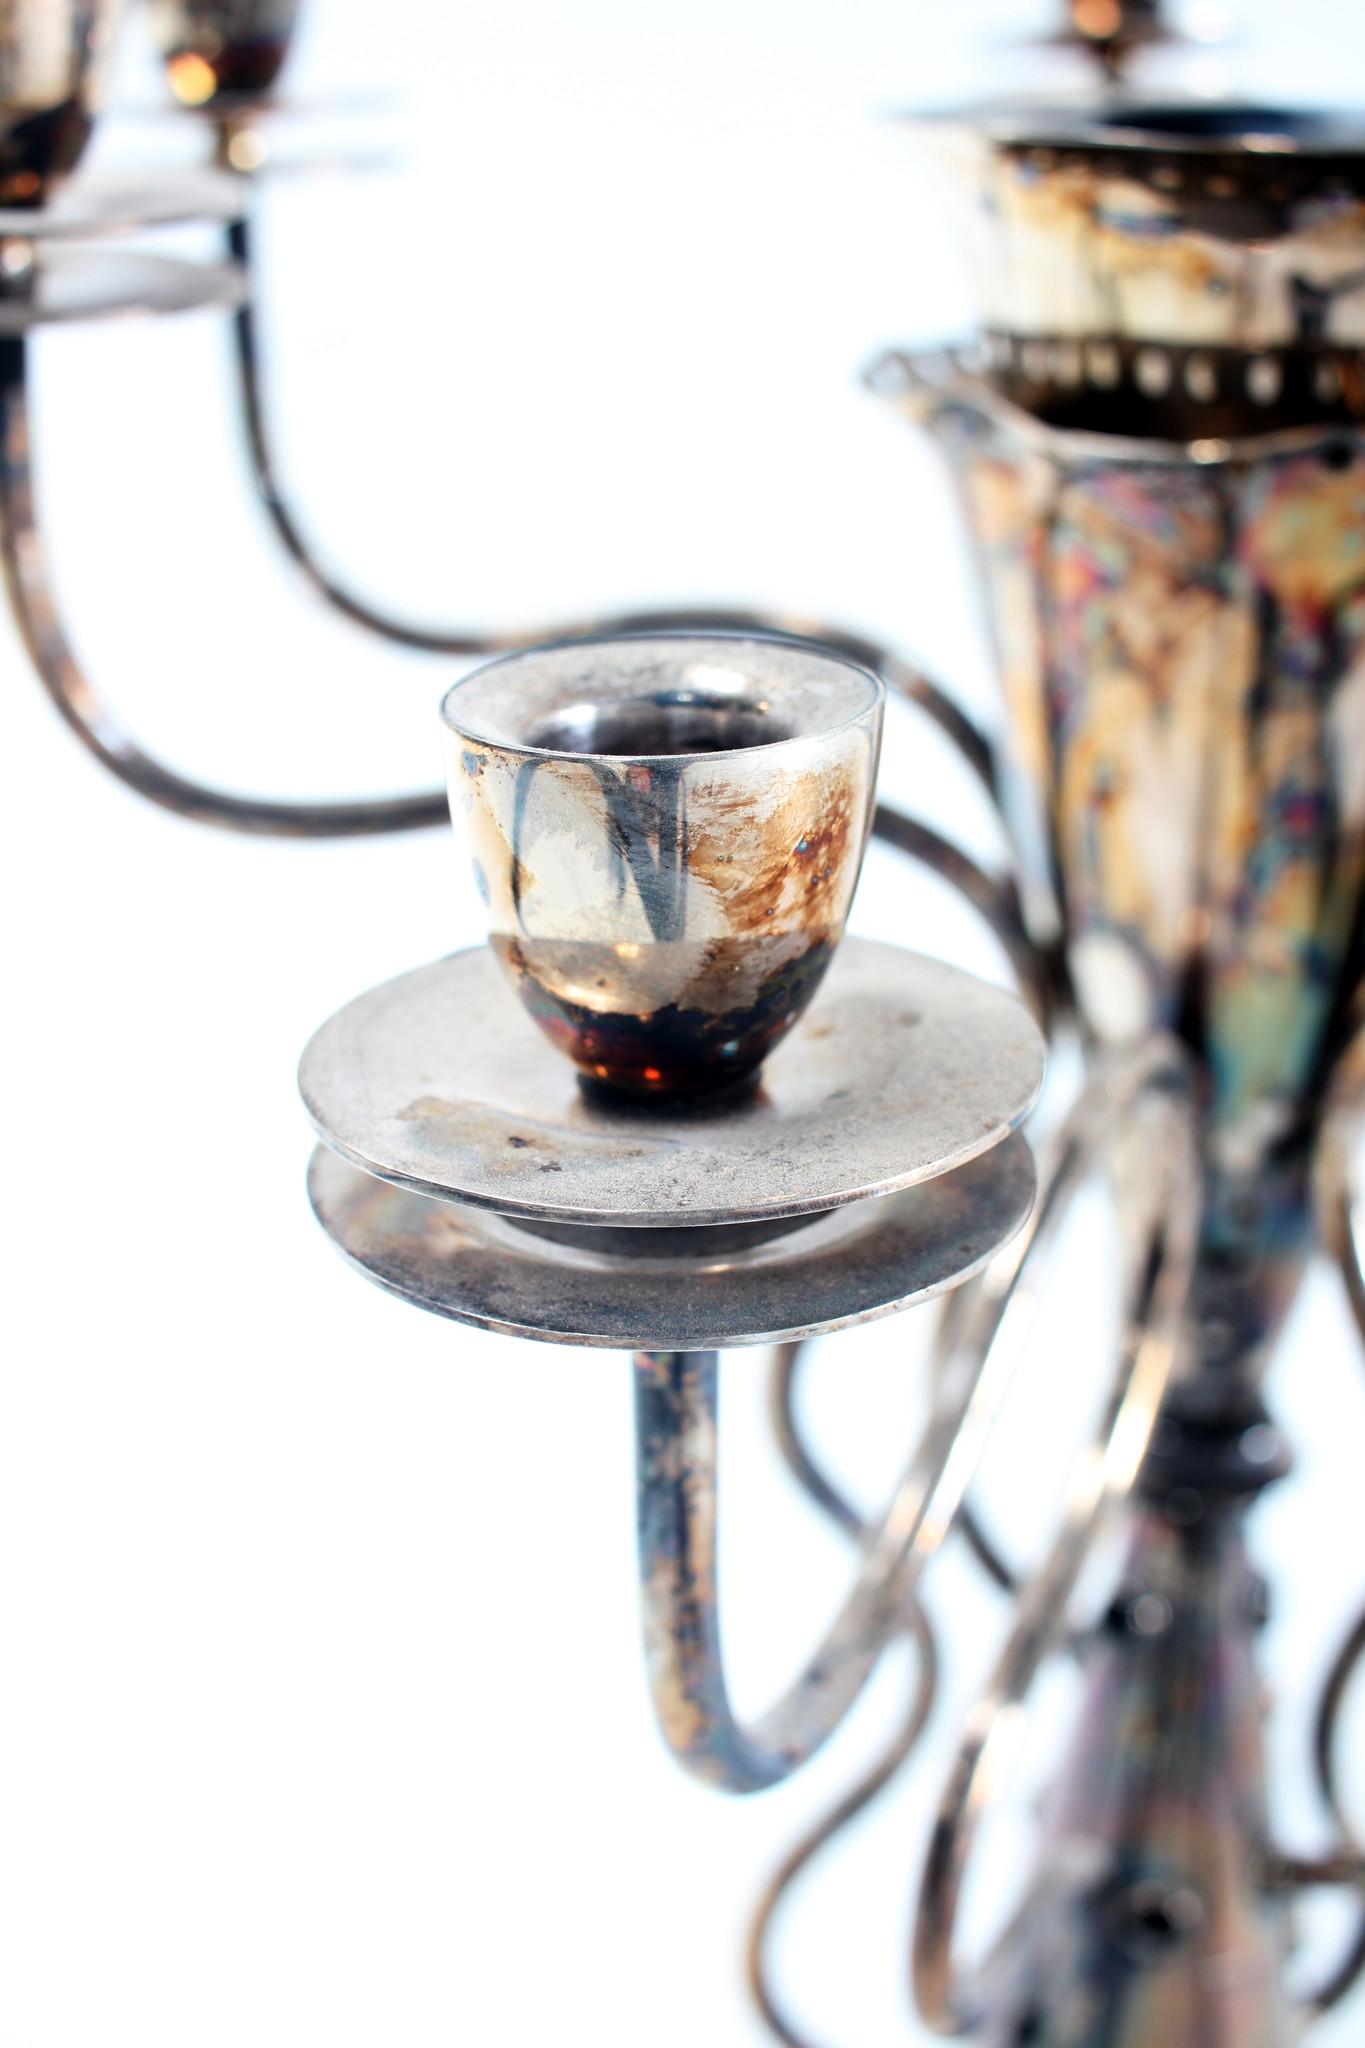 Driade candleholder - Borek Sipek